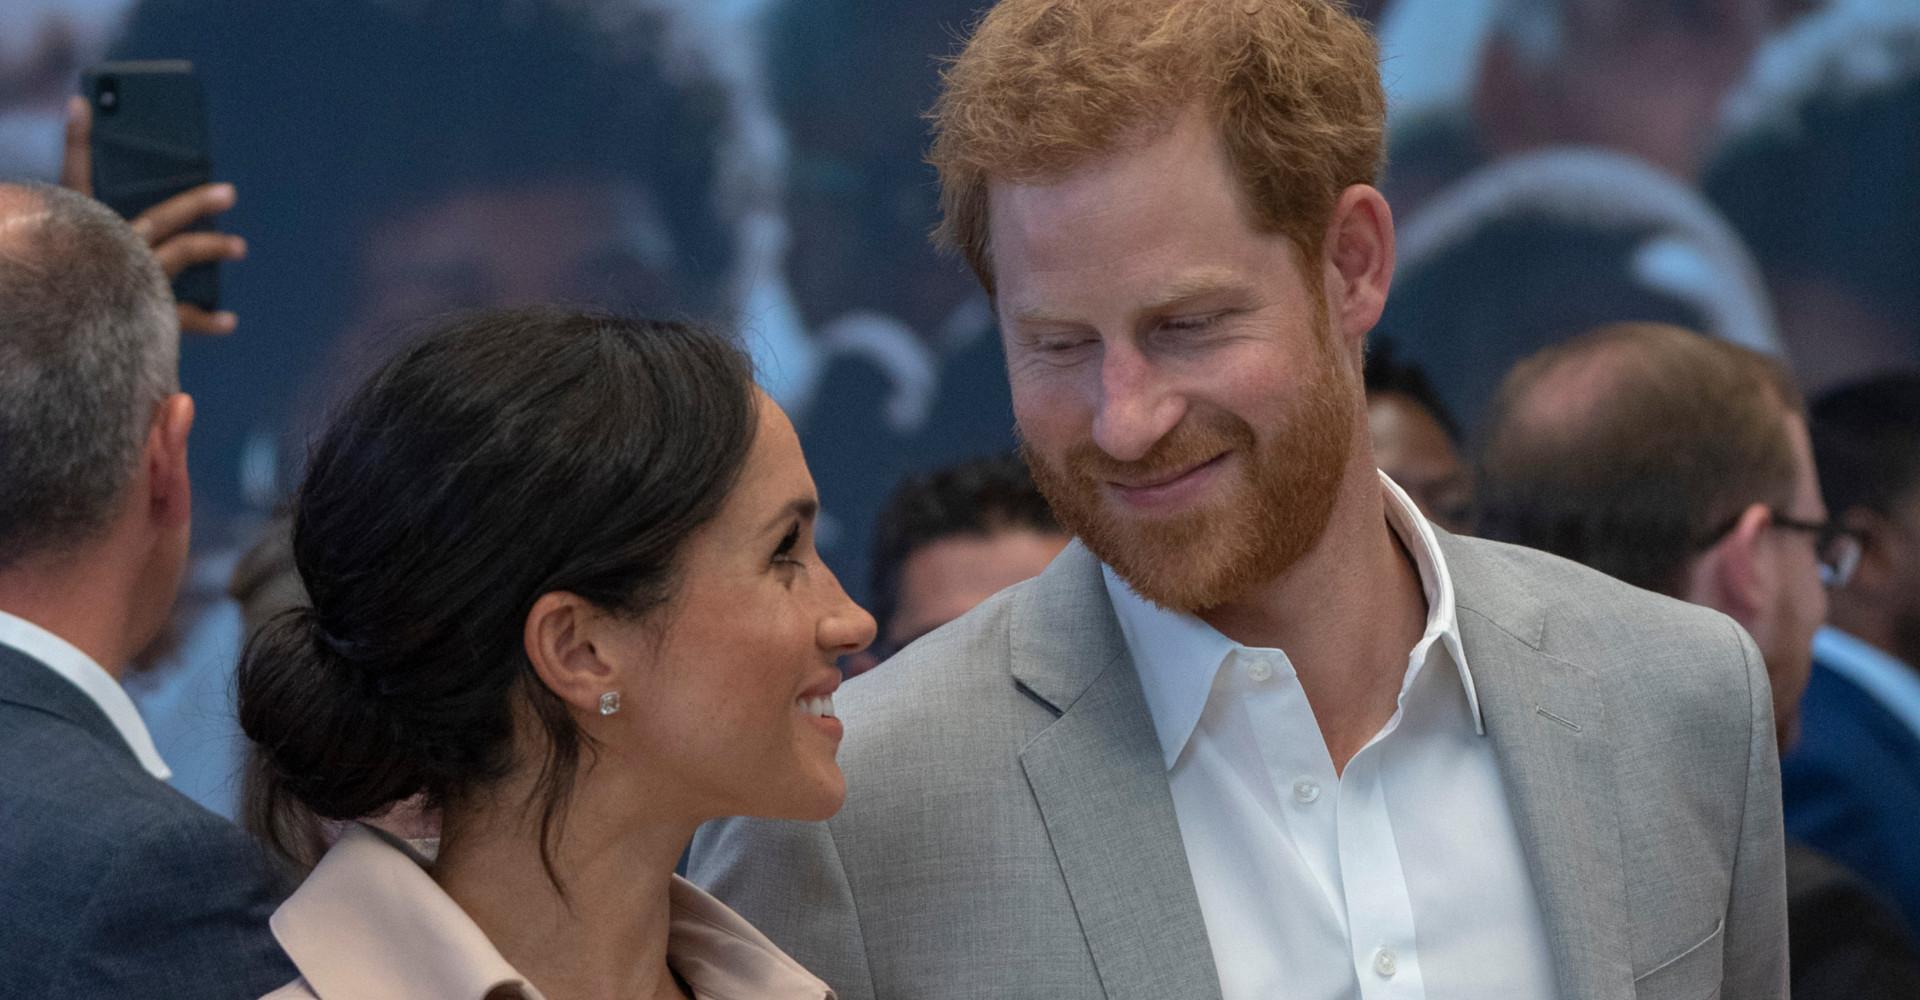 Harry e Meghan, gli sposini reali innamorati pazzi